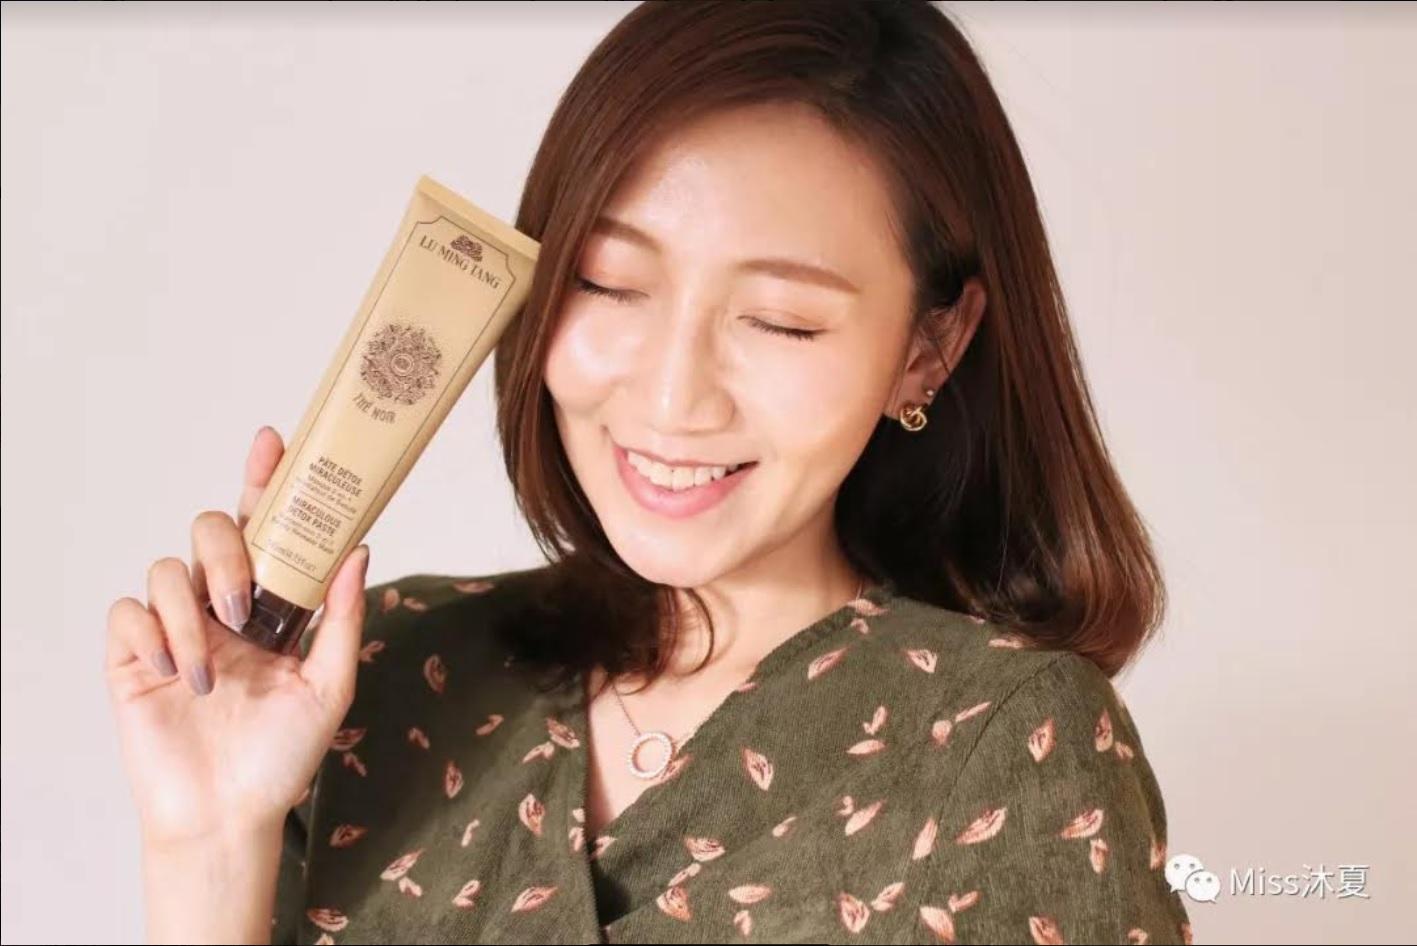 KOL natural cosmetics